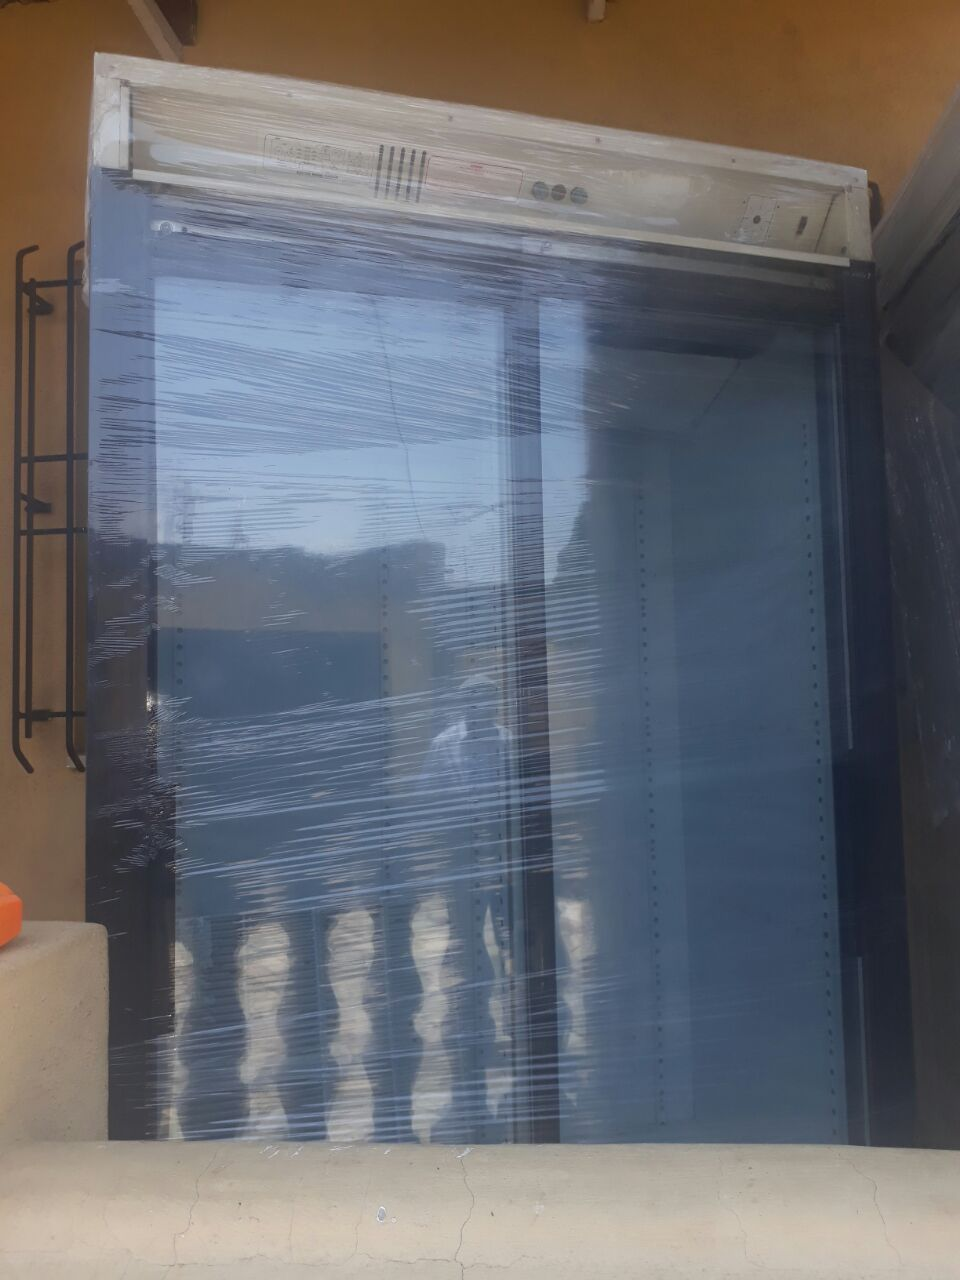 Dispaly fridges